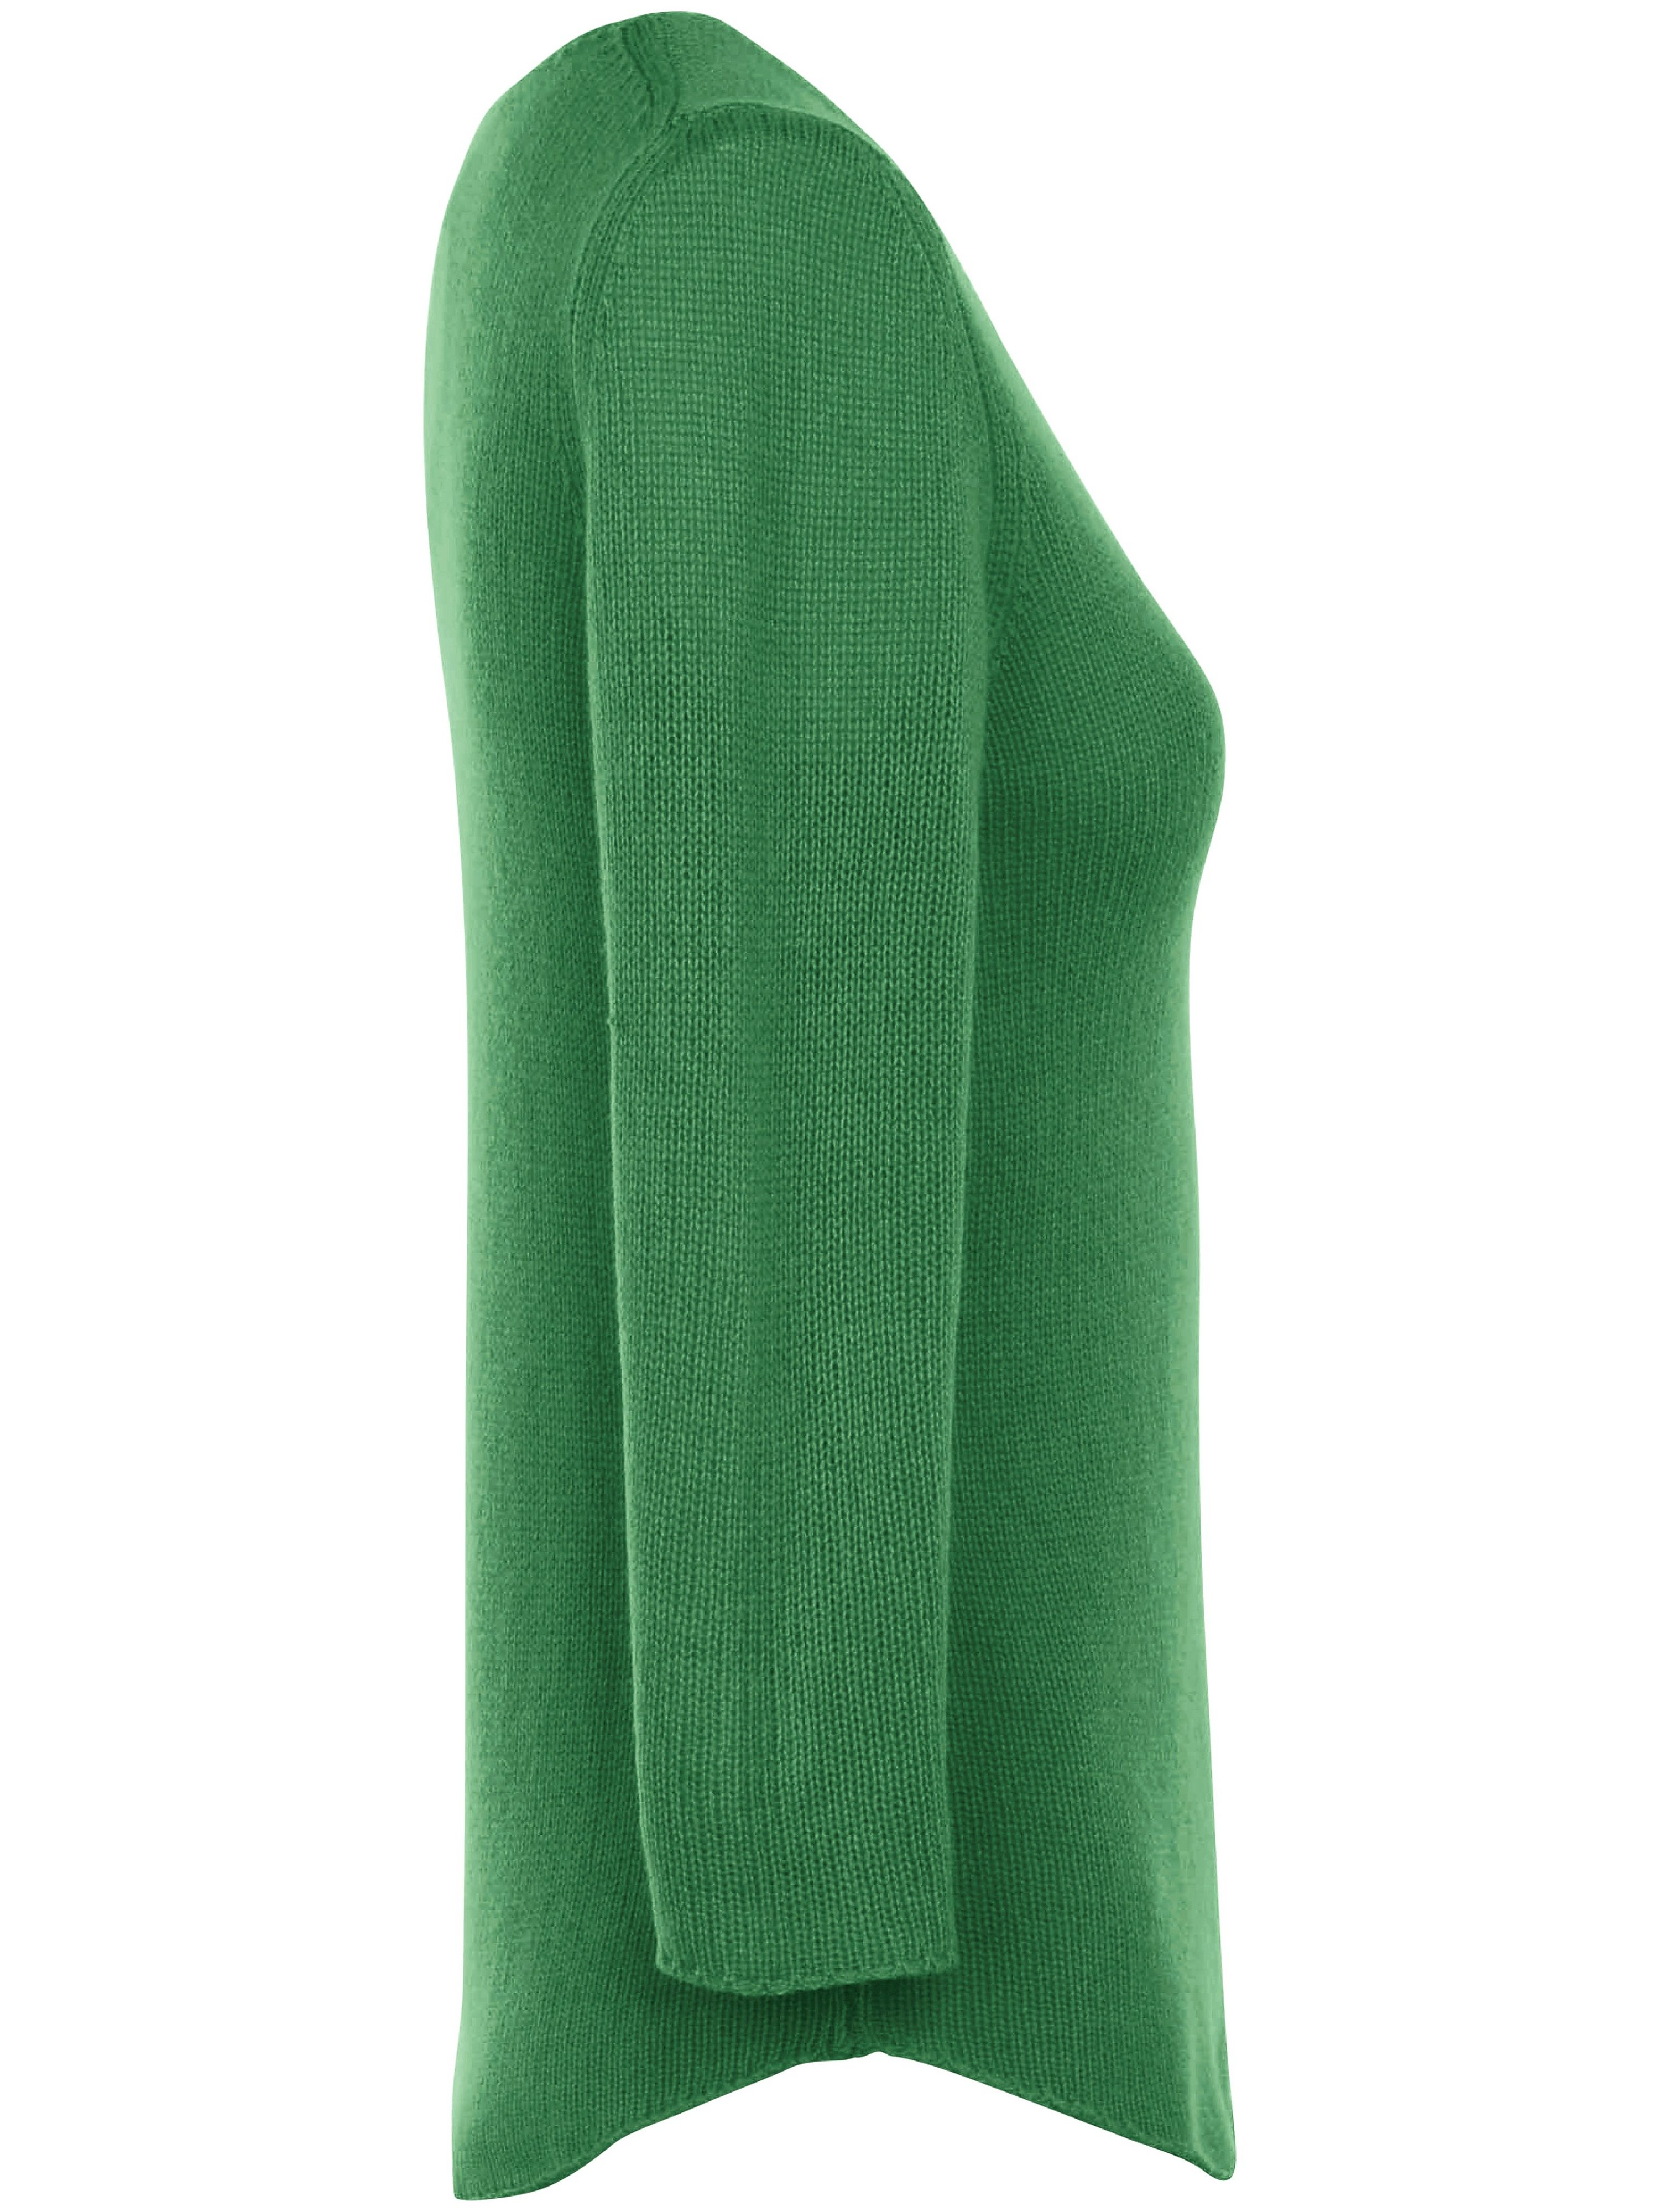 Strikbluse 100 kashmir i Premiumvalitet Fra Peter Hahn Cashmere grøn